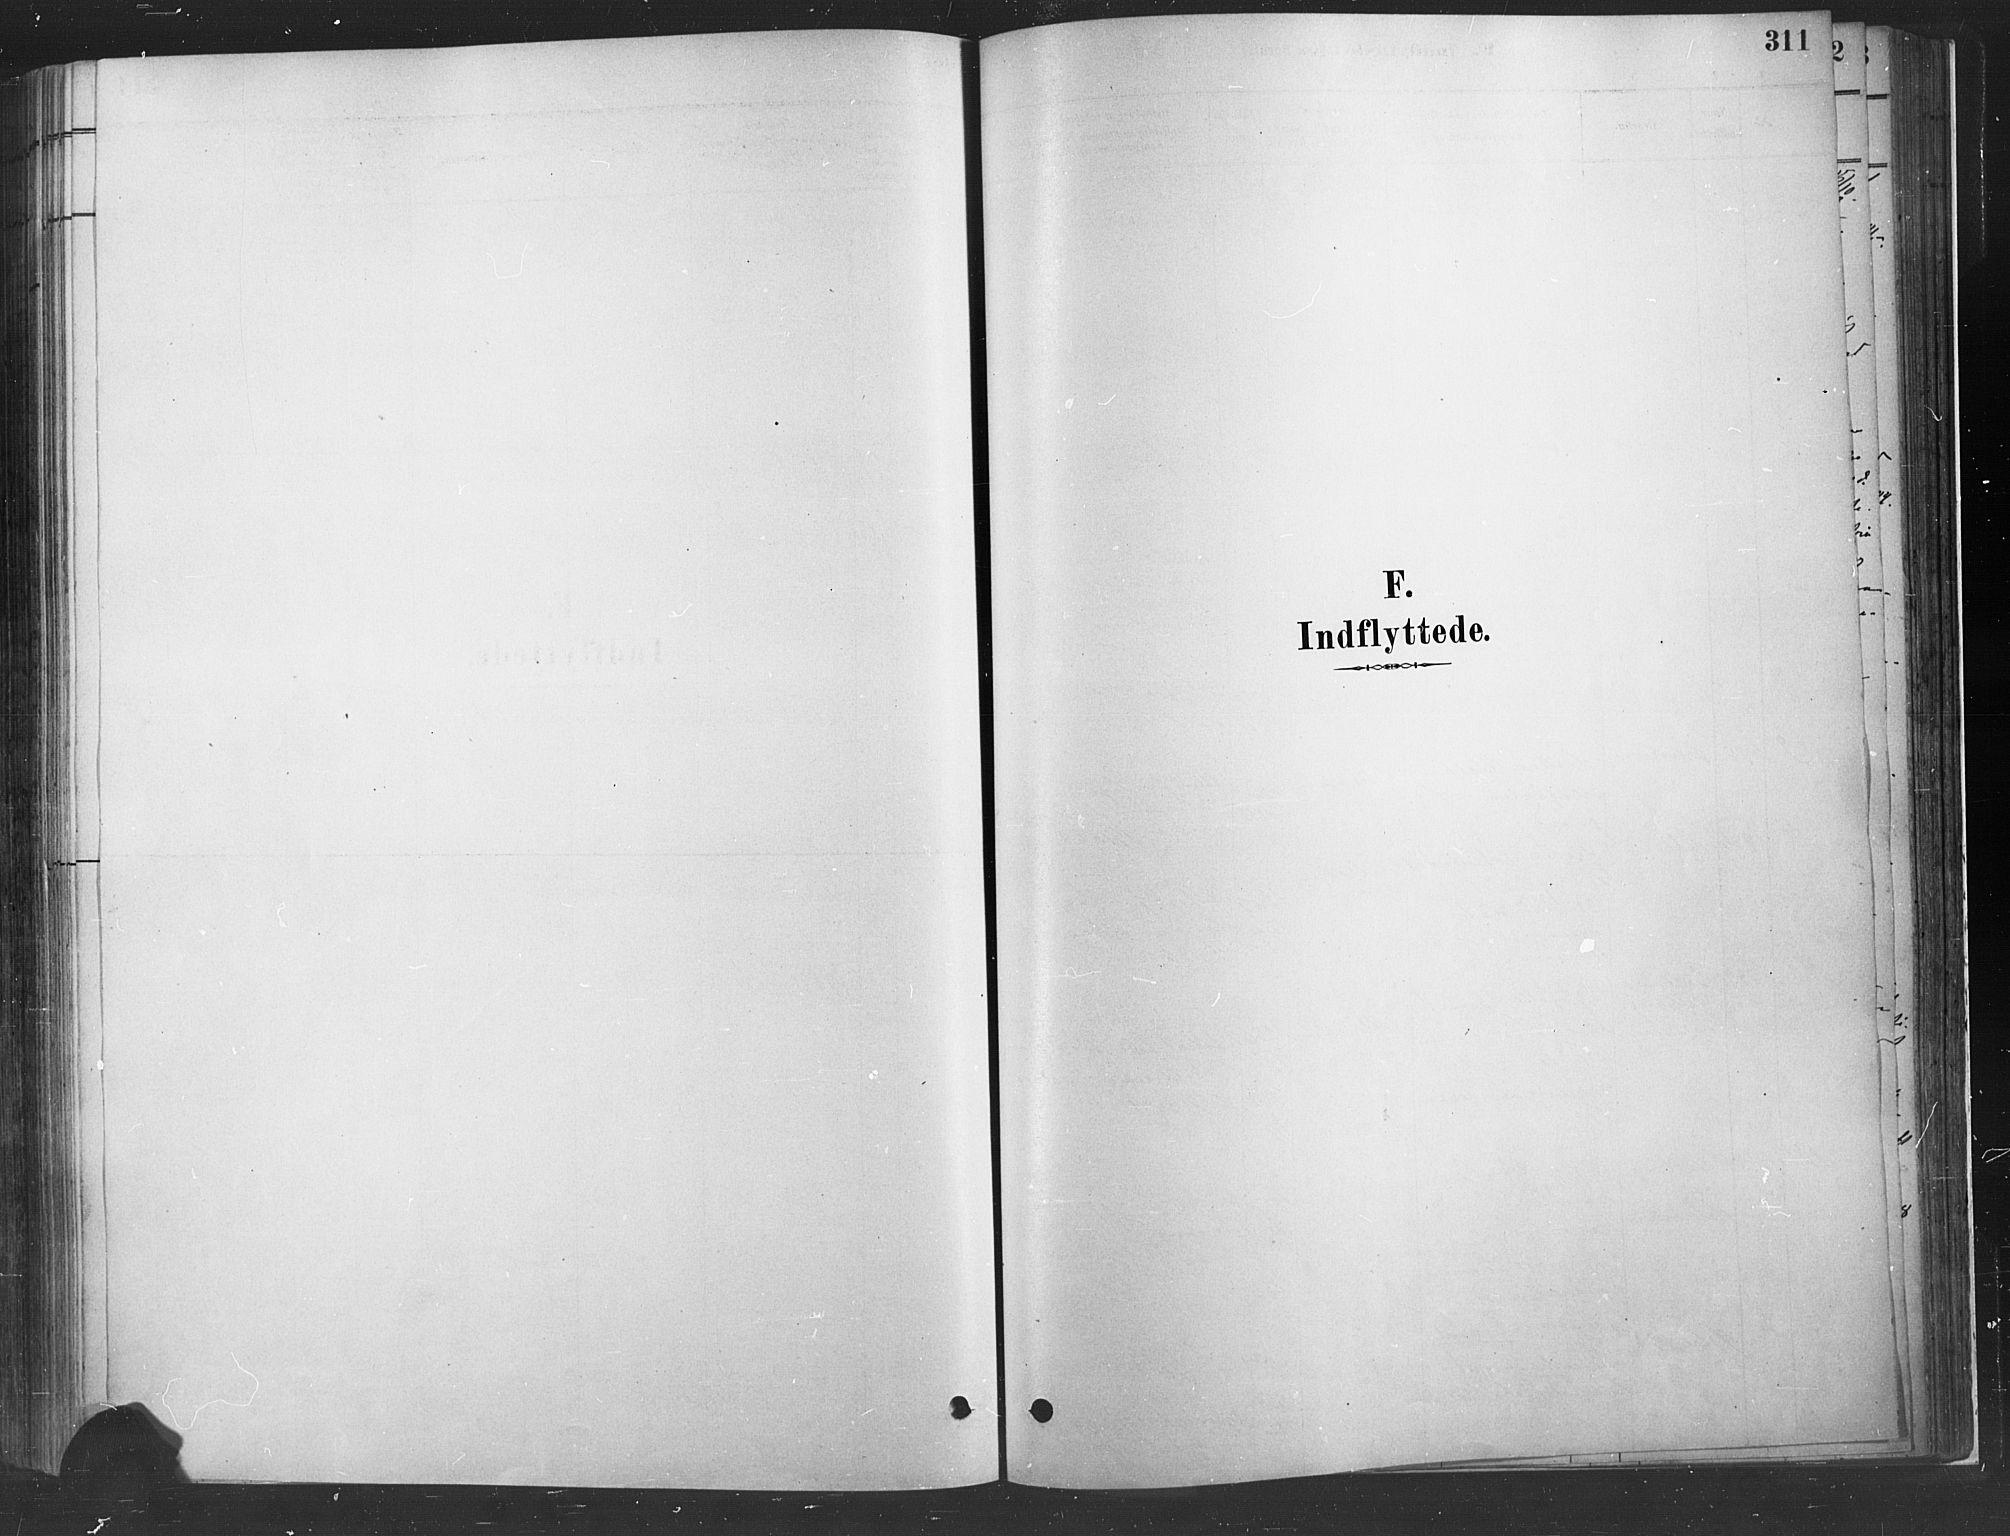 SAH, Fåberg prestekontor, H/Ha/Haa/L0010: Ministerialbok nr. 10, 1879-1900, s. 311